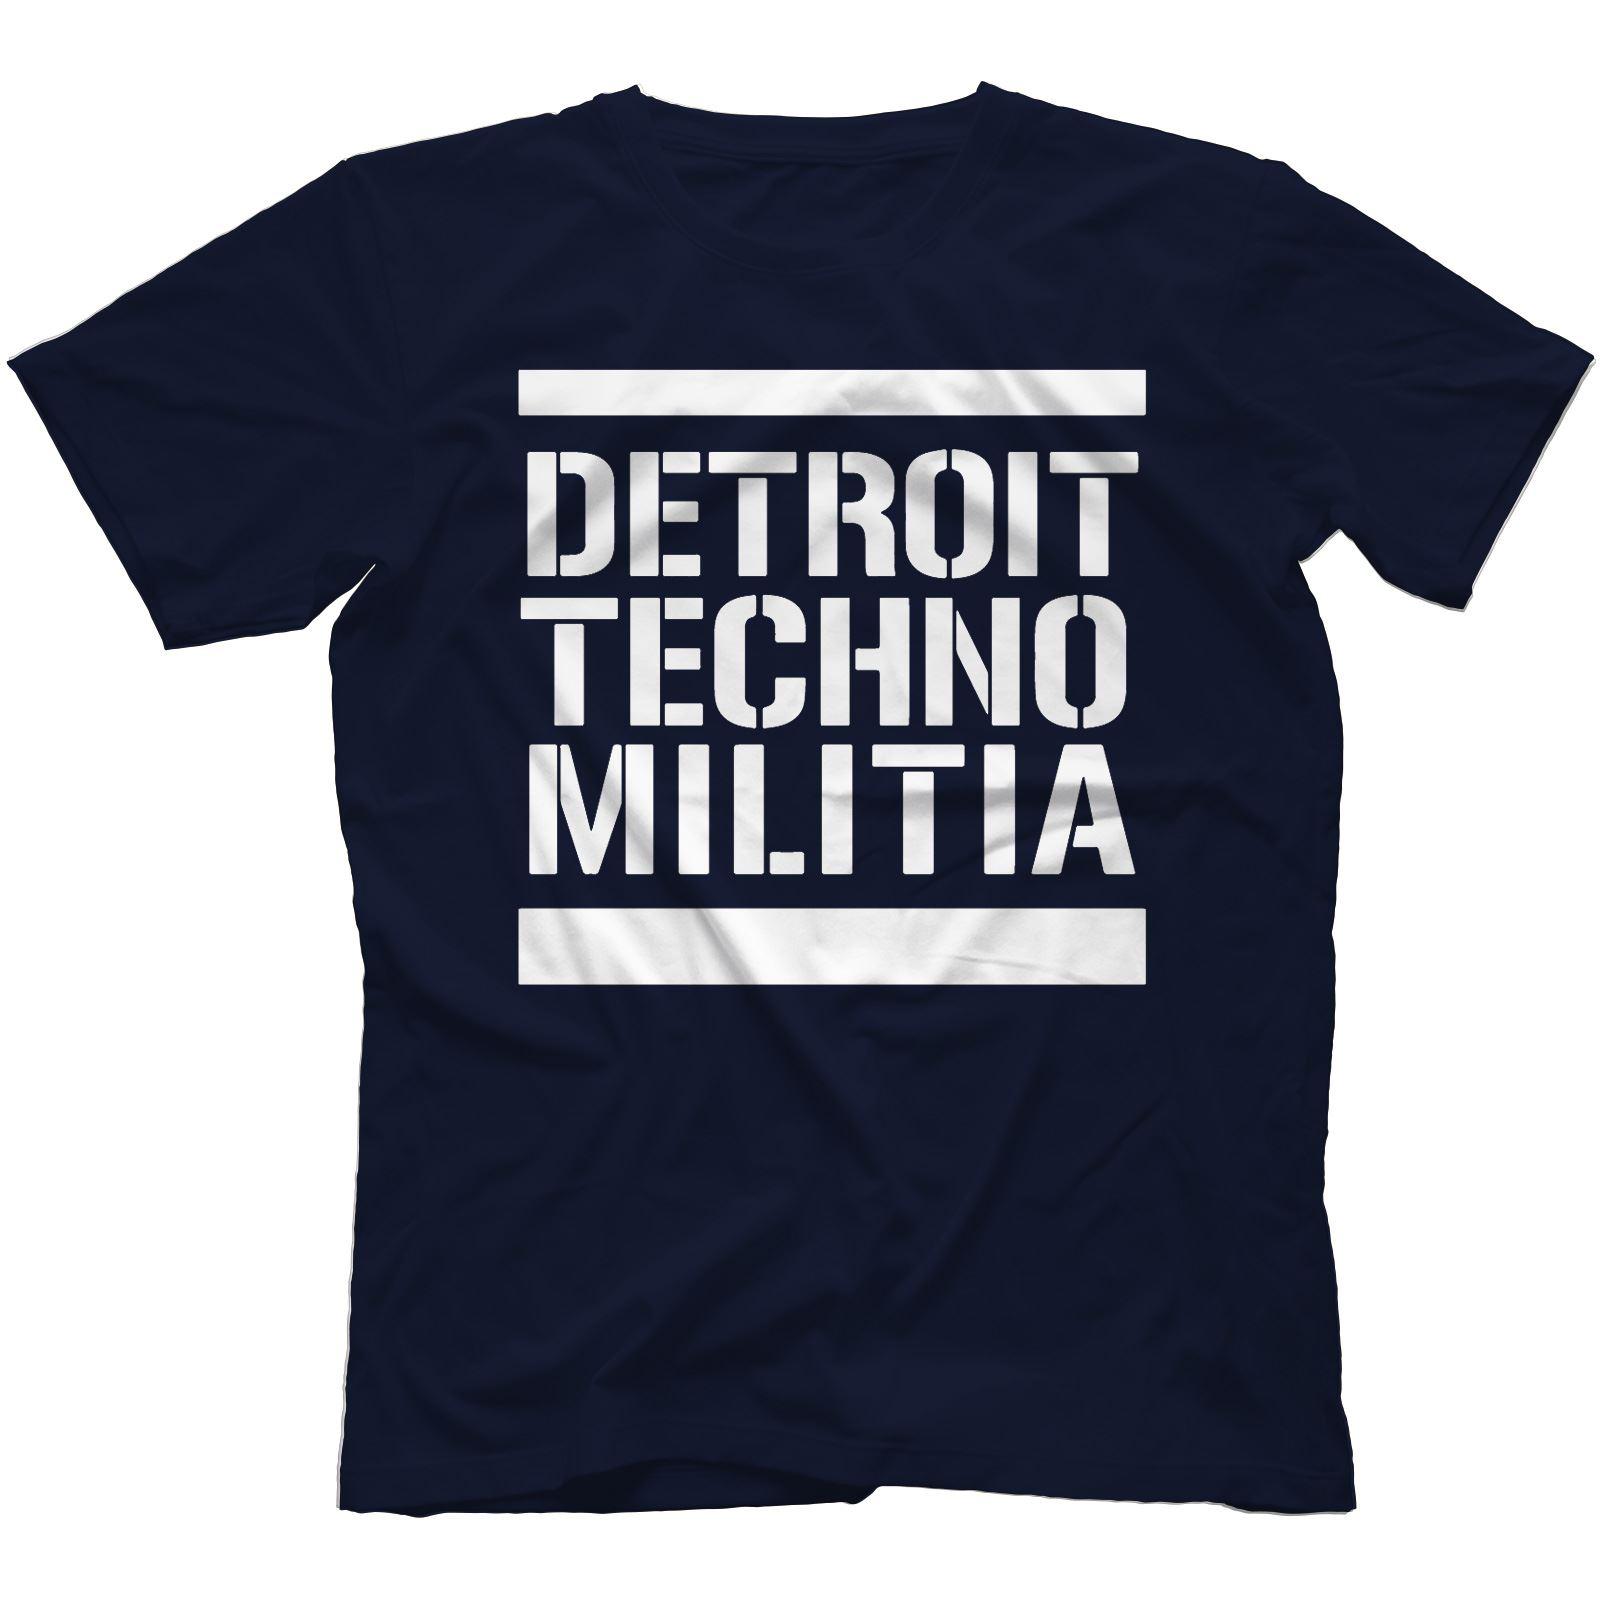 Detroit-Techno-Militia-T-Shirt-100-Cotton-Vinyl-909-Underground-Resistance Indexbild 31